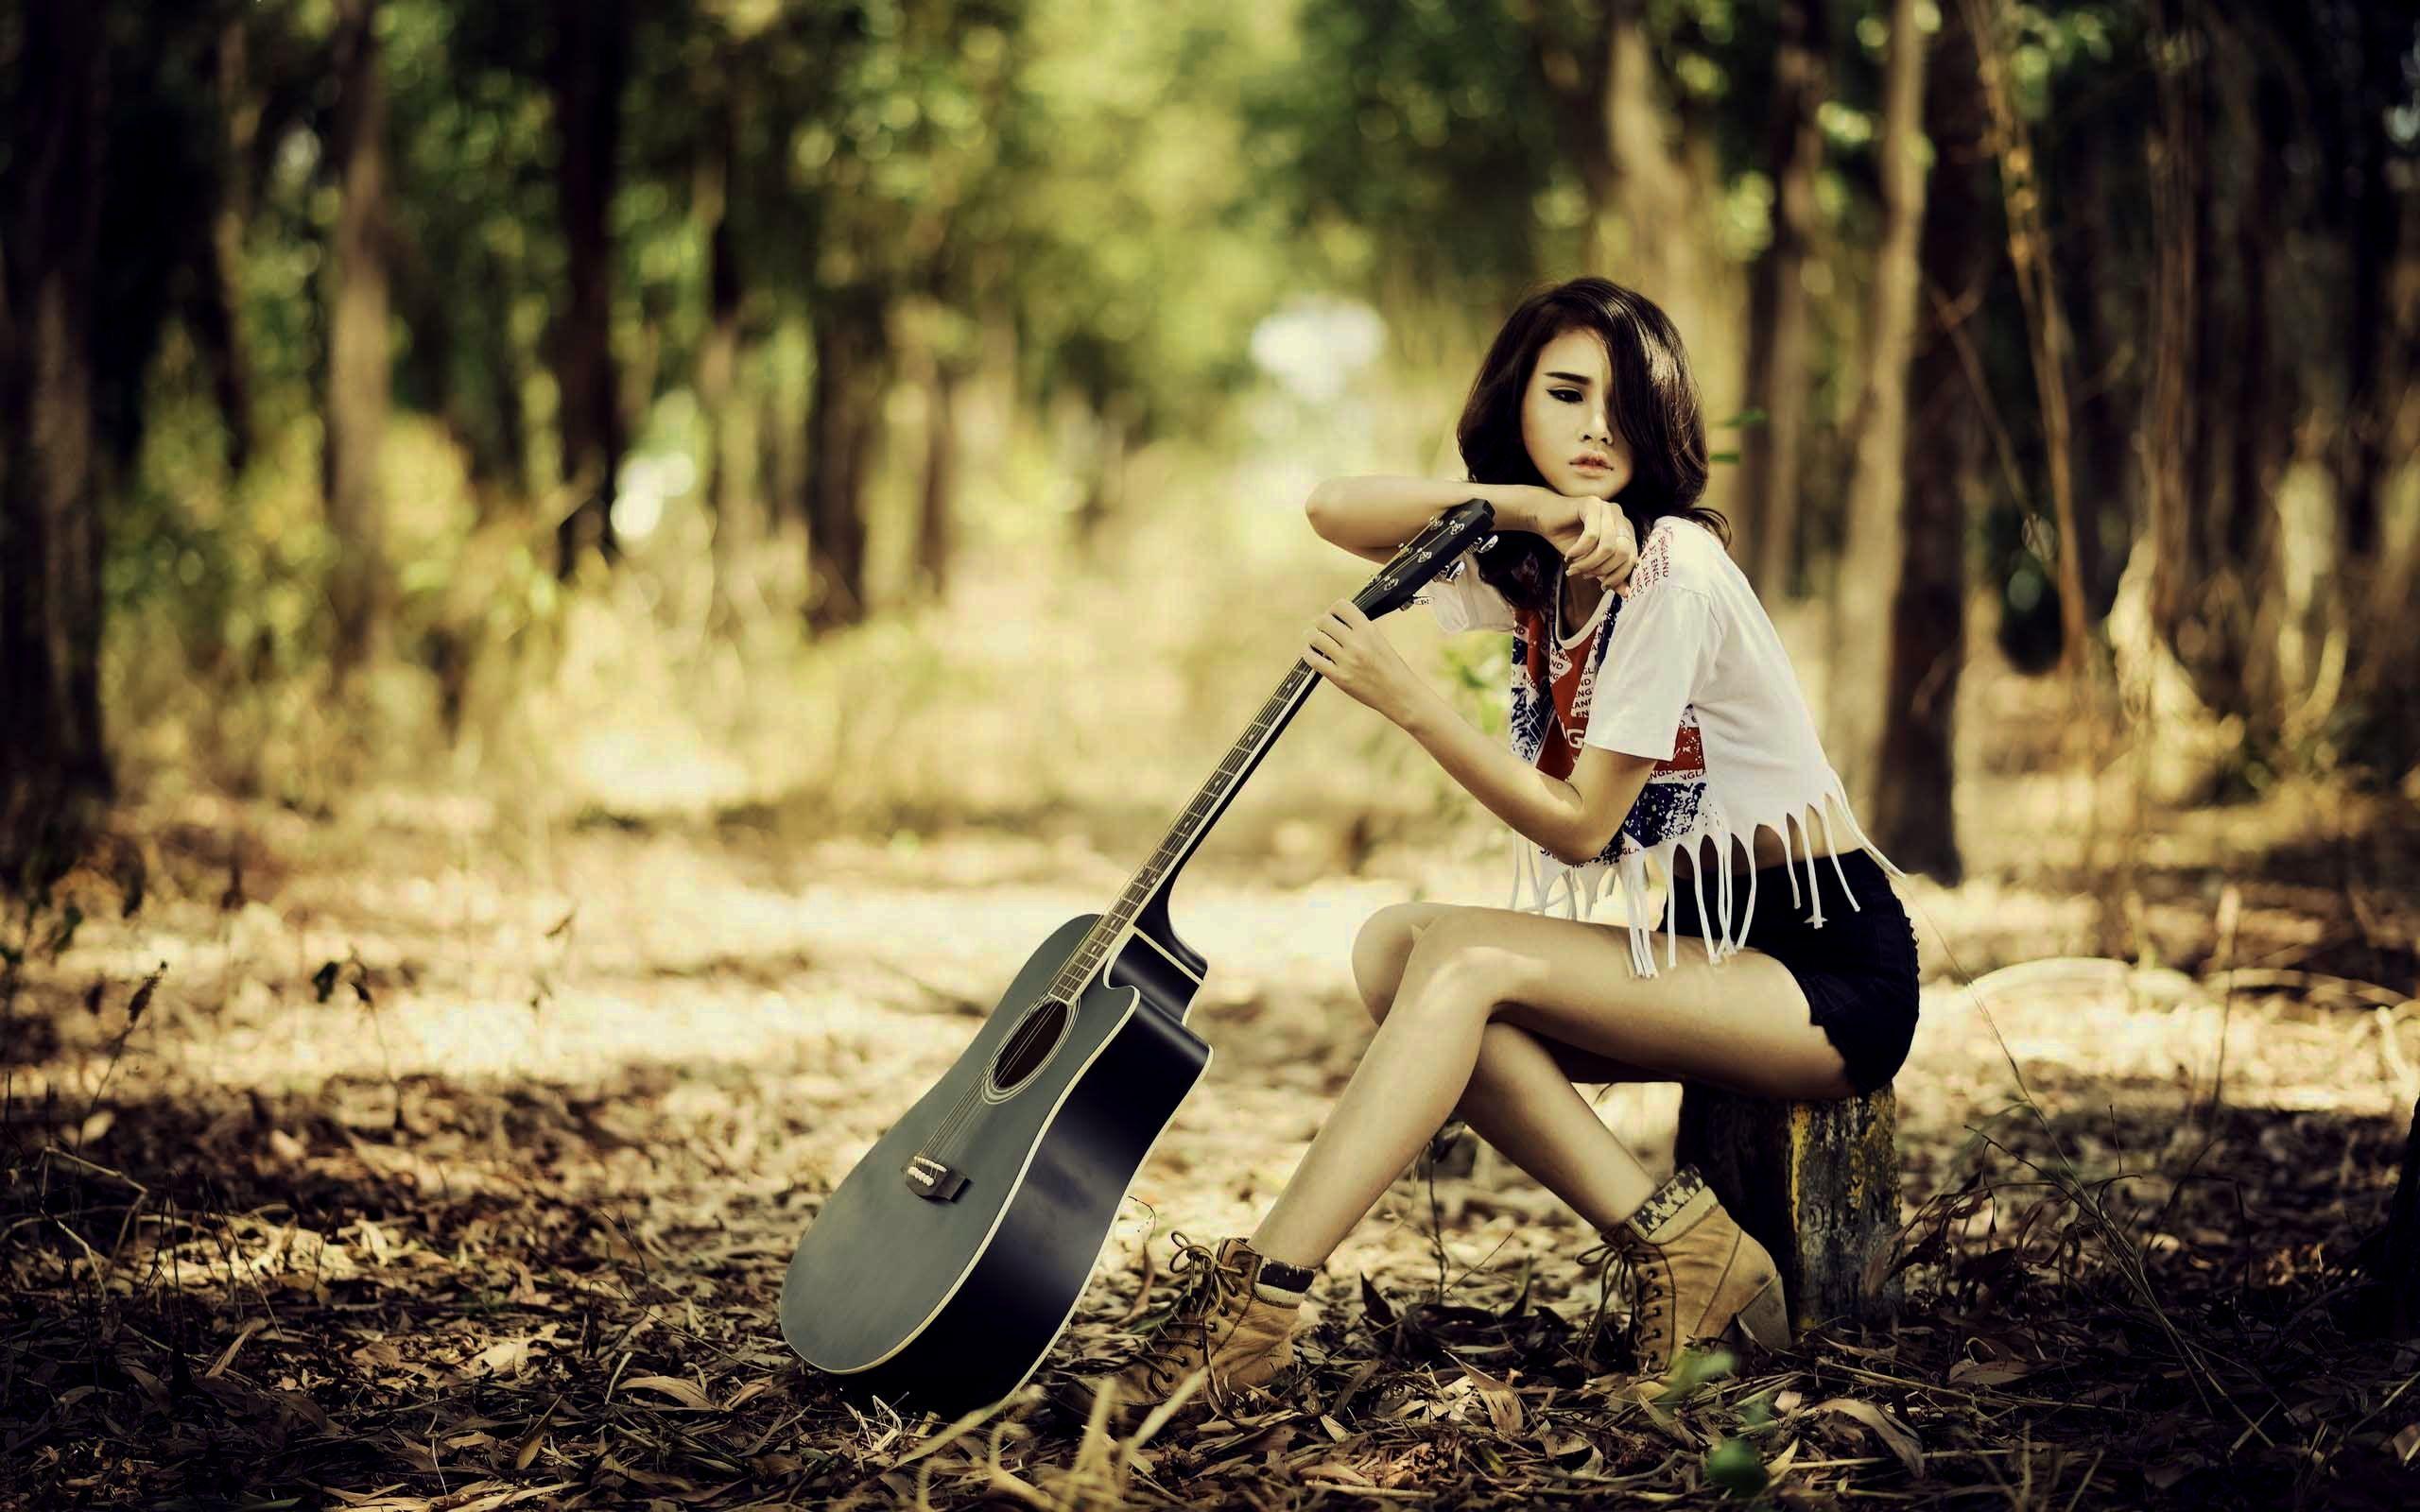 Картинки на обои девушка в косухе с гитарой